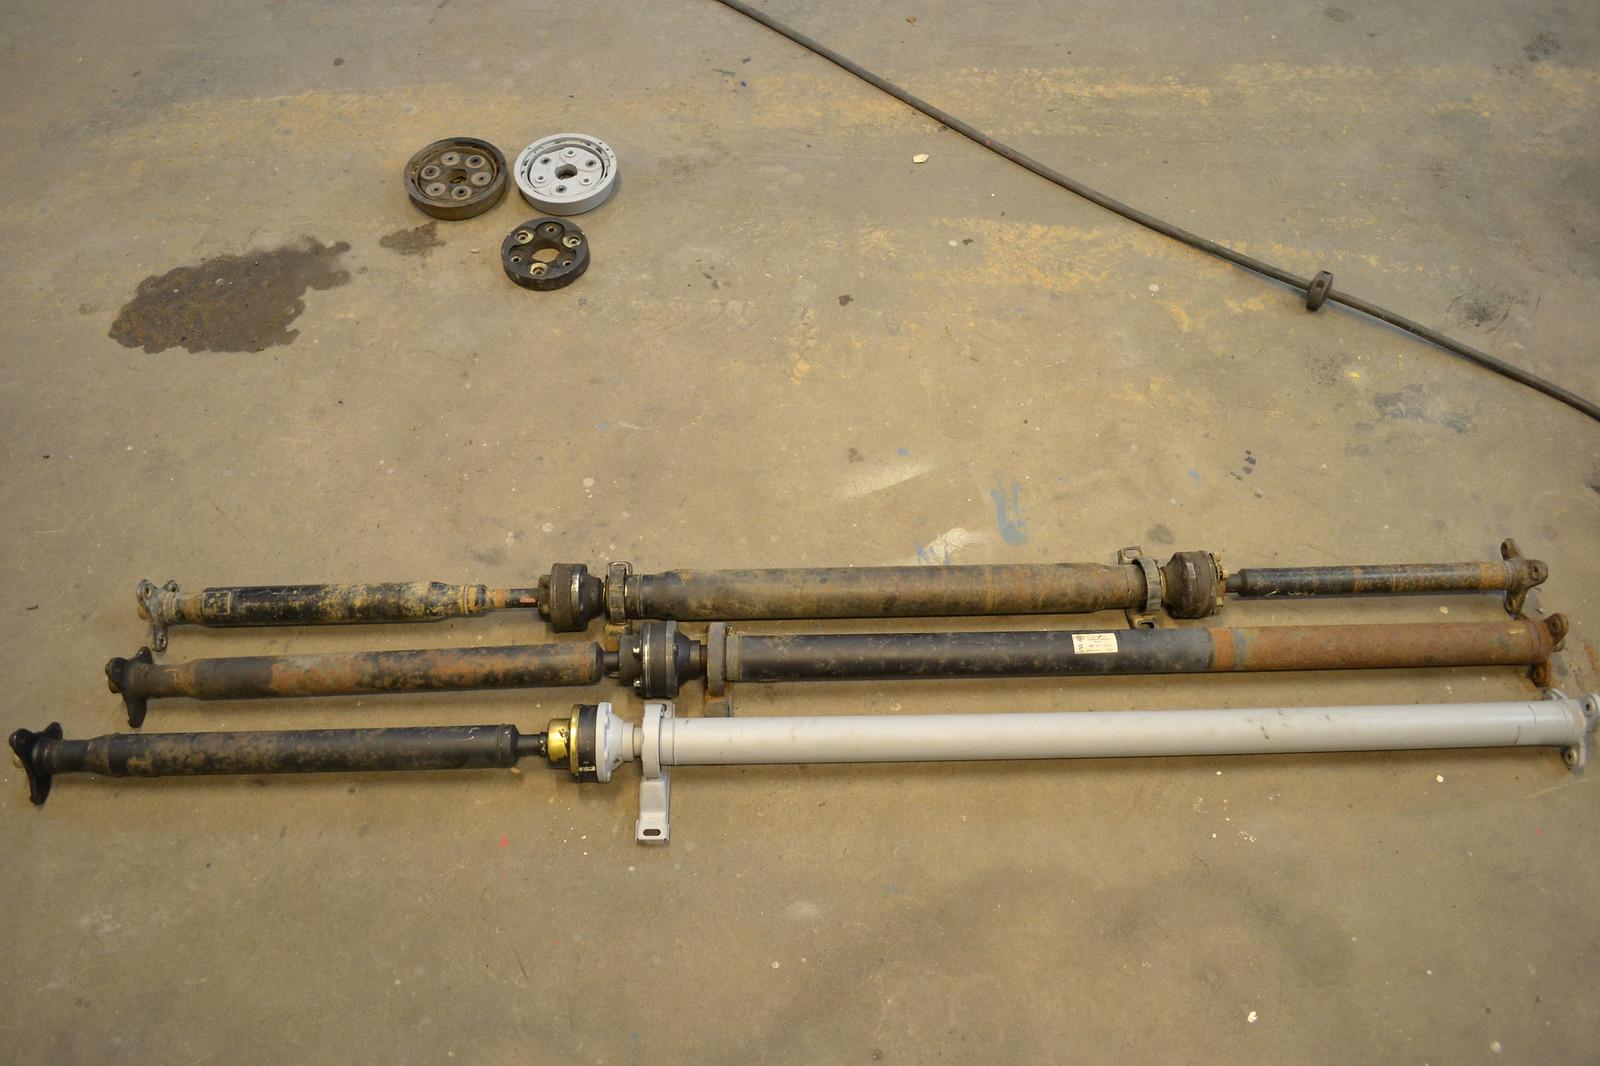 Pellikka: Golf 2 20vt, 02M 6-spd ja 4motion rakentelua. - Sivu 9 33915871631_e3739b8c9c_h